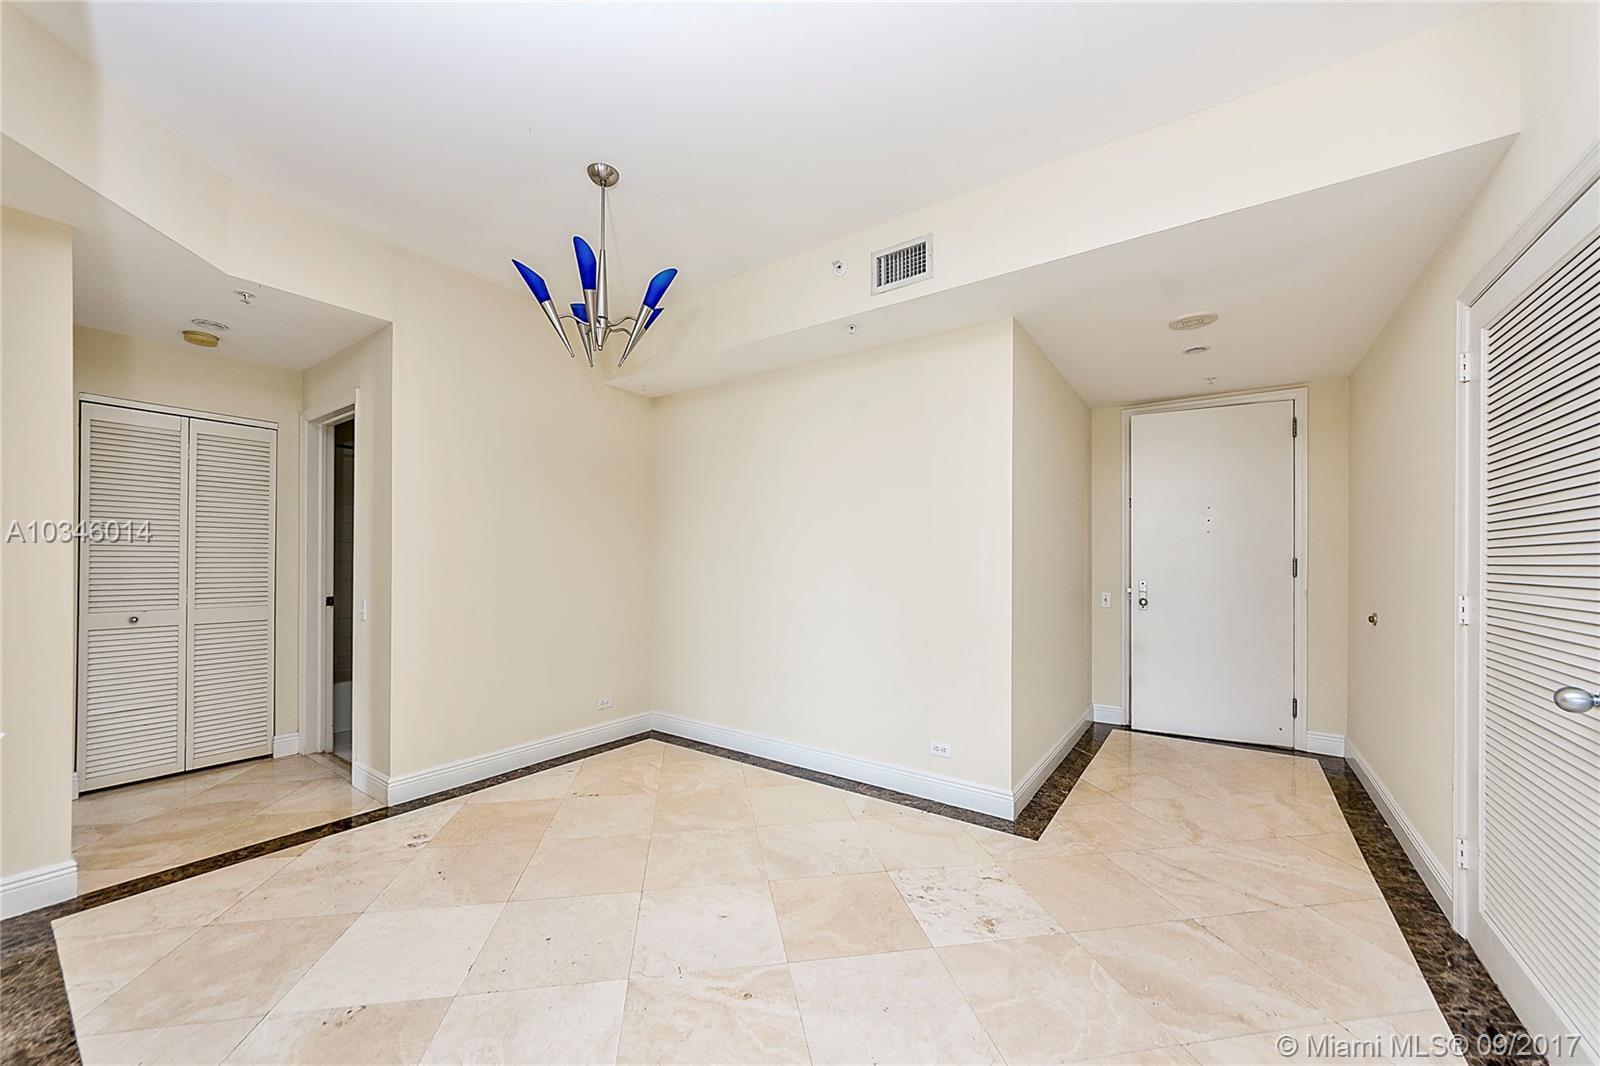 888 Brickell Key Dr #603, Miami FL, 33131